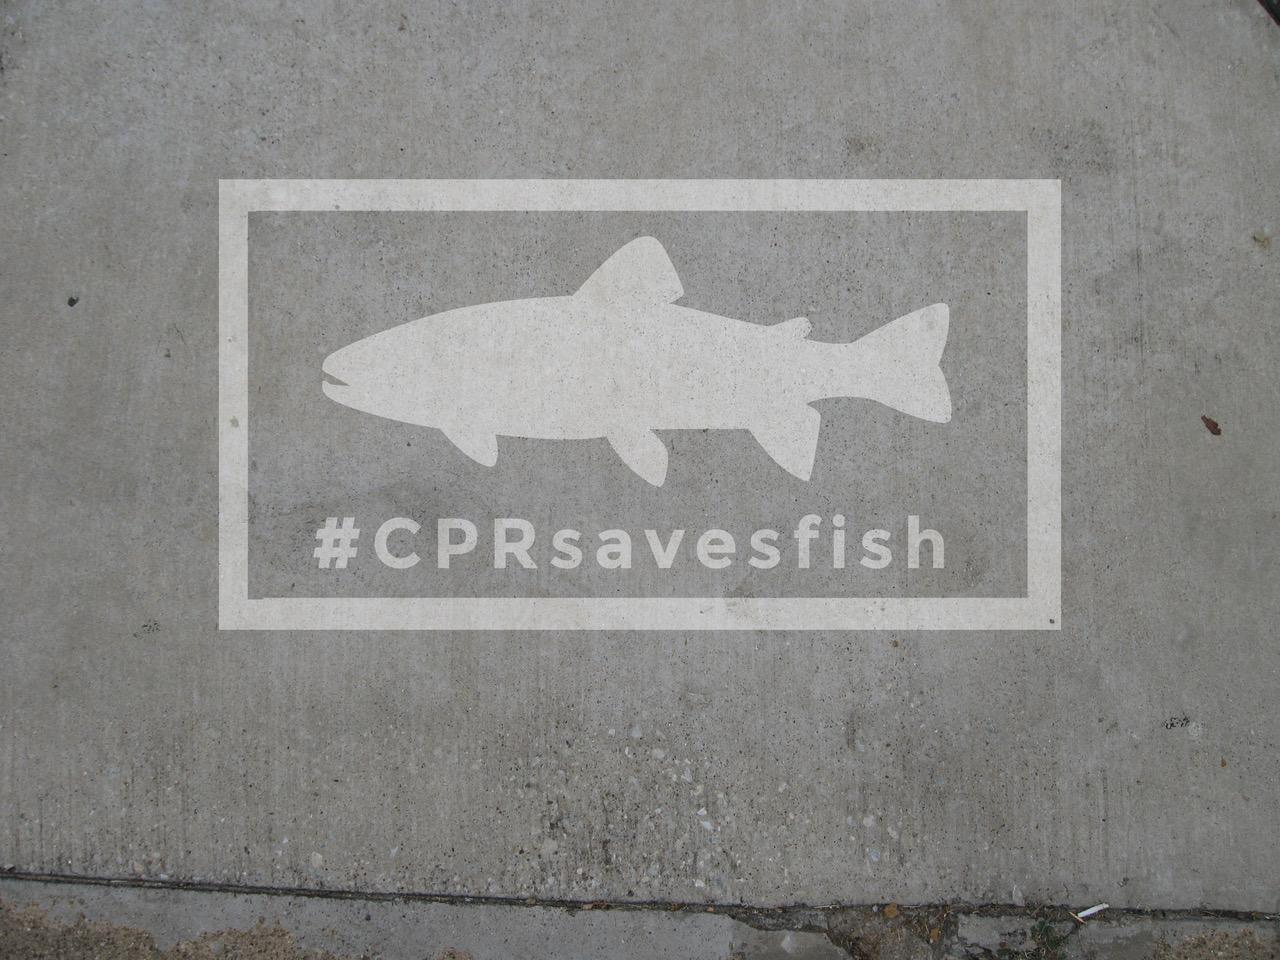 https://fishinginireland.info/cprsavesfish/wp-content/uploads/2017/07/CPRsavesfish-Stencil-2-1.jpg